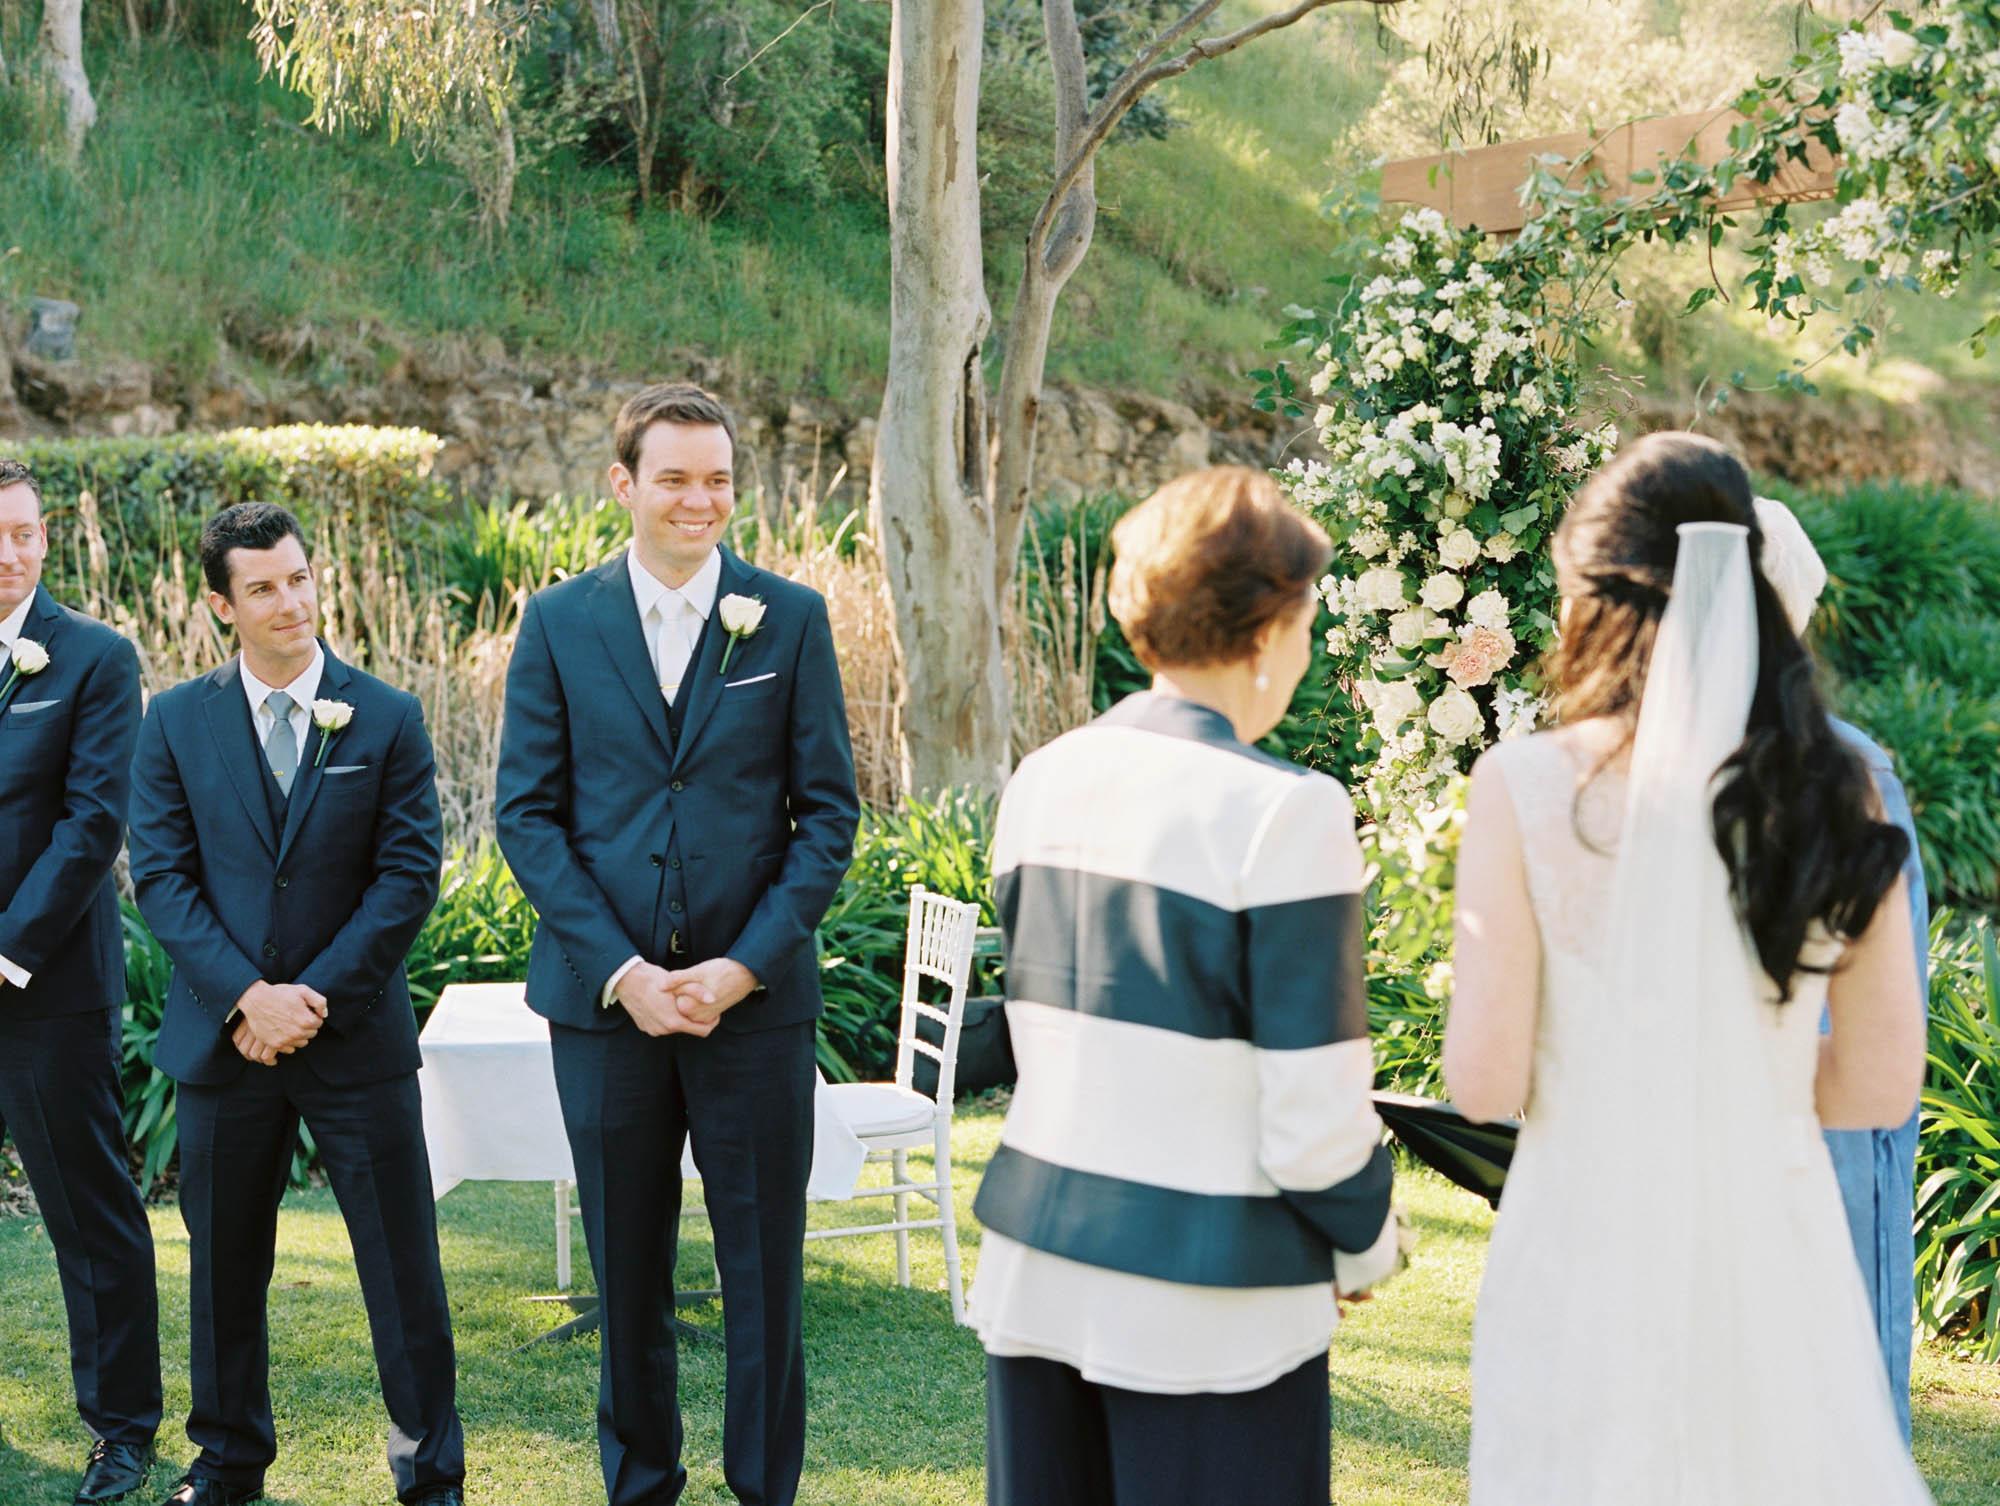 Glen-Ewin-Estate-wedding-photography-034.jpg